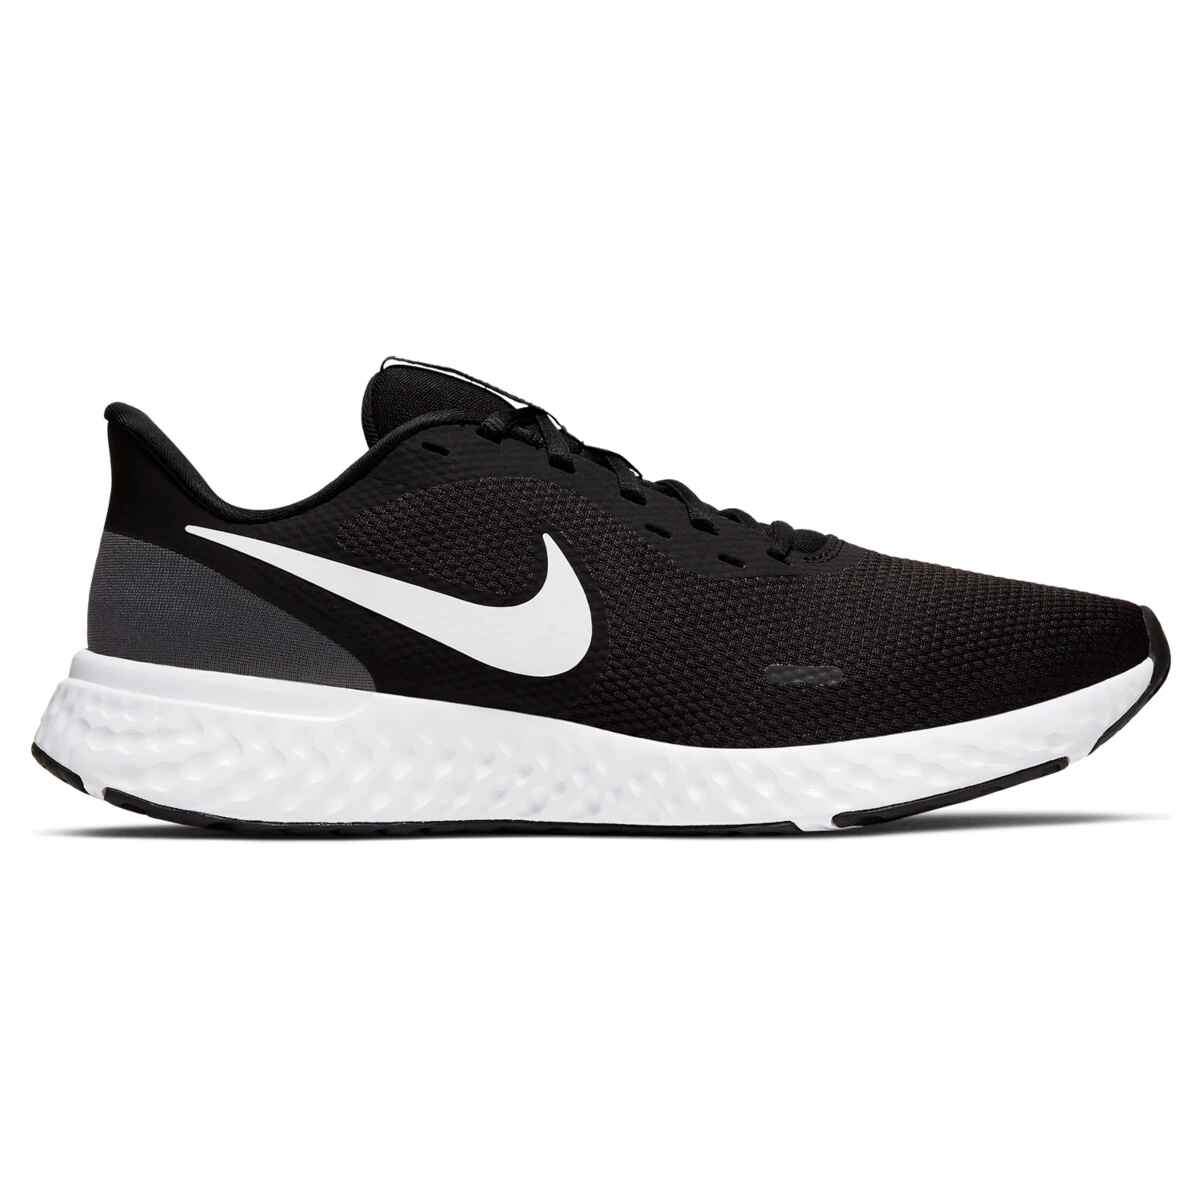 Zapatillas de running de hombre Revolution 5 Nike